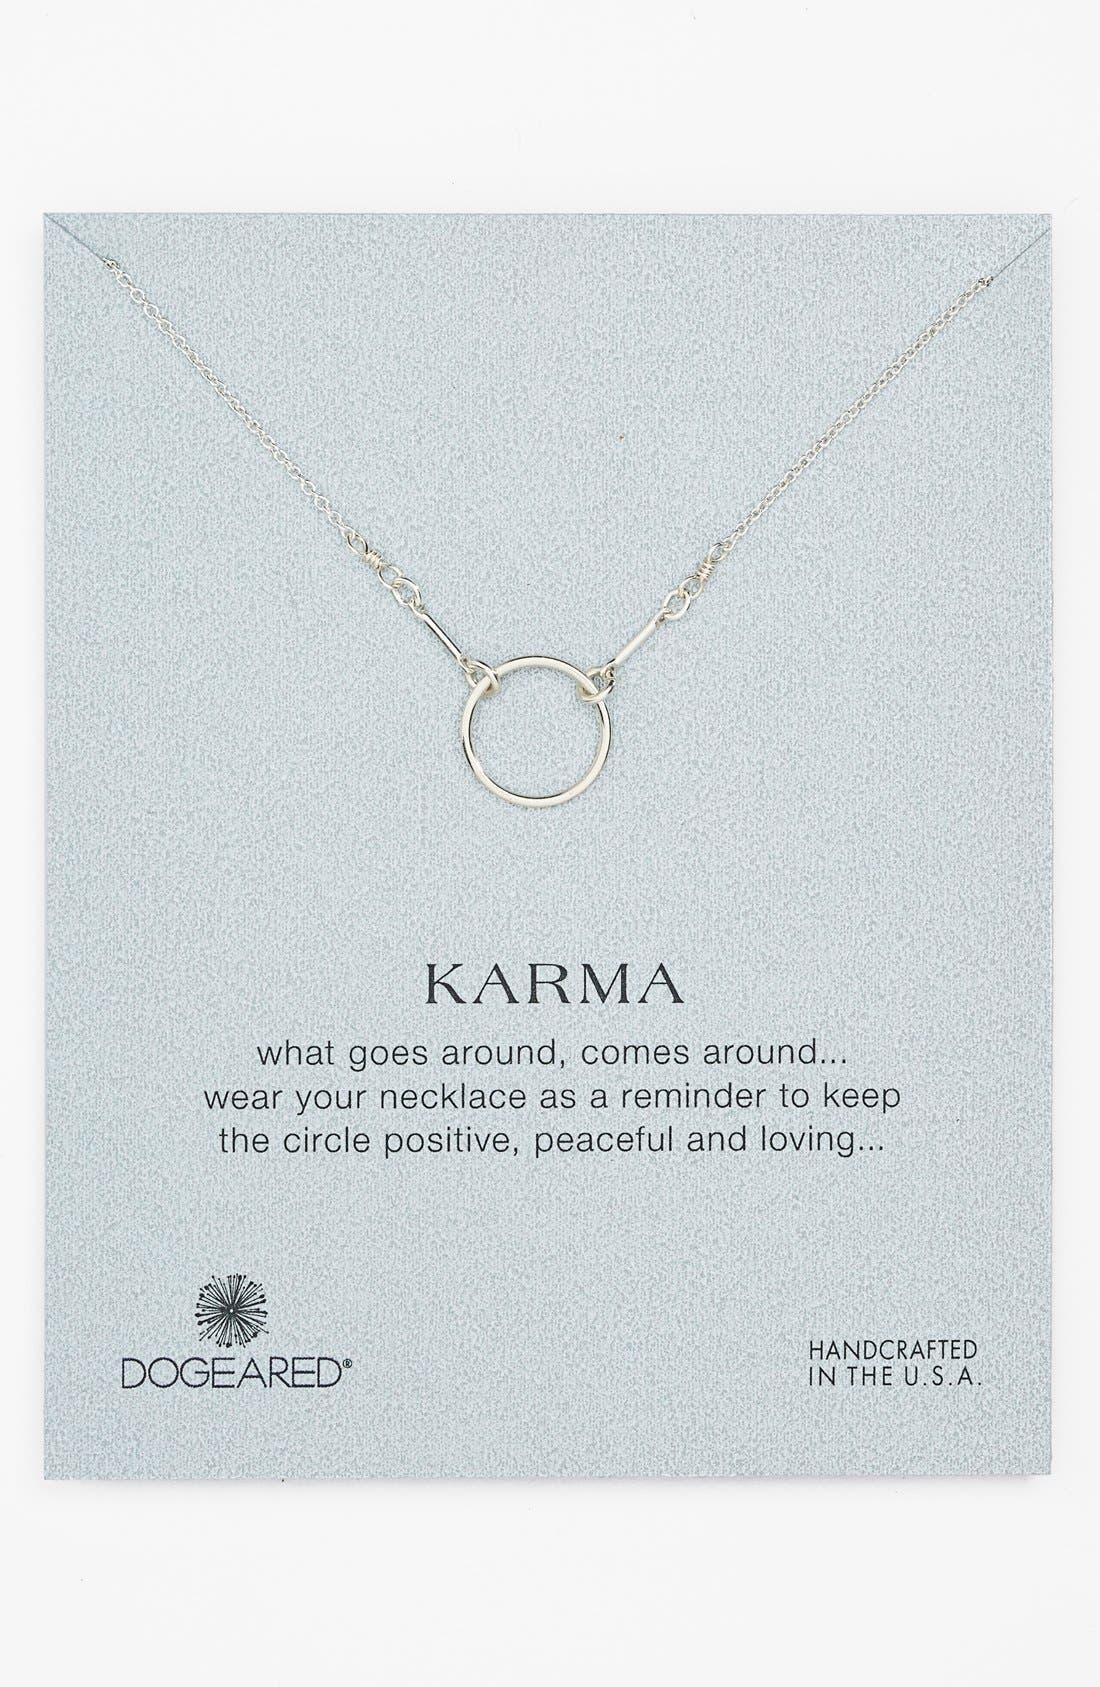 Alternate Image 1 Selected - Dogeared 'Reminder - Karma' Pendant Necklace